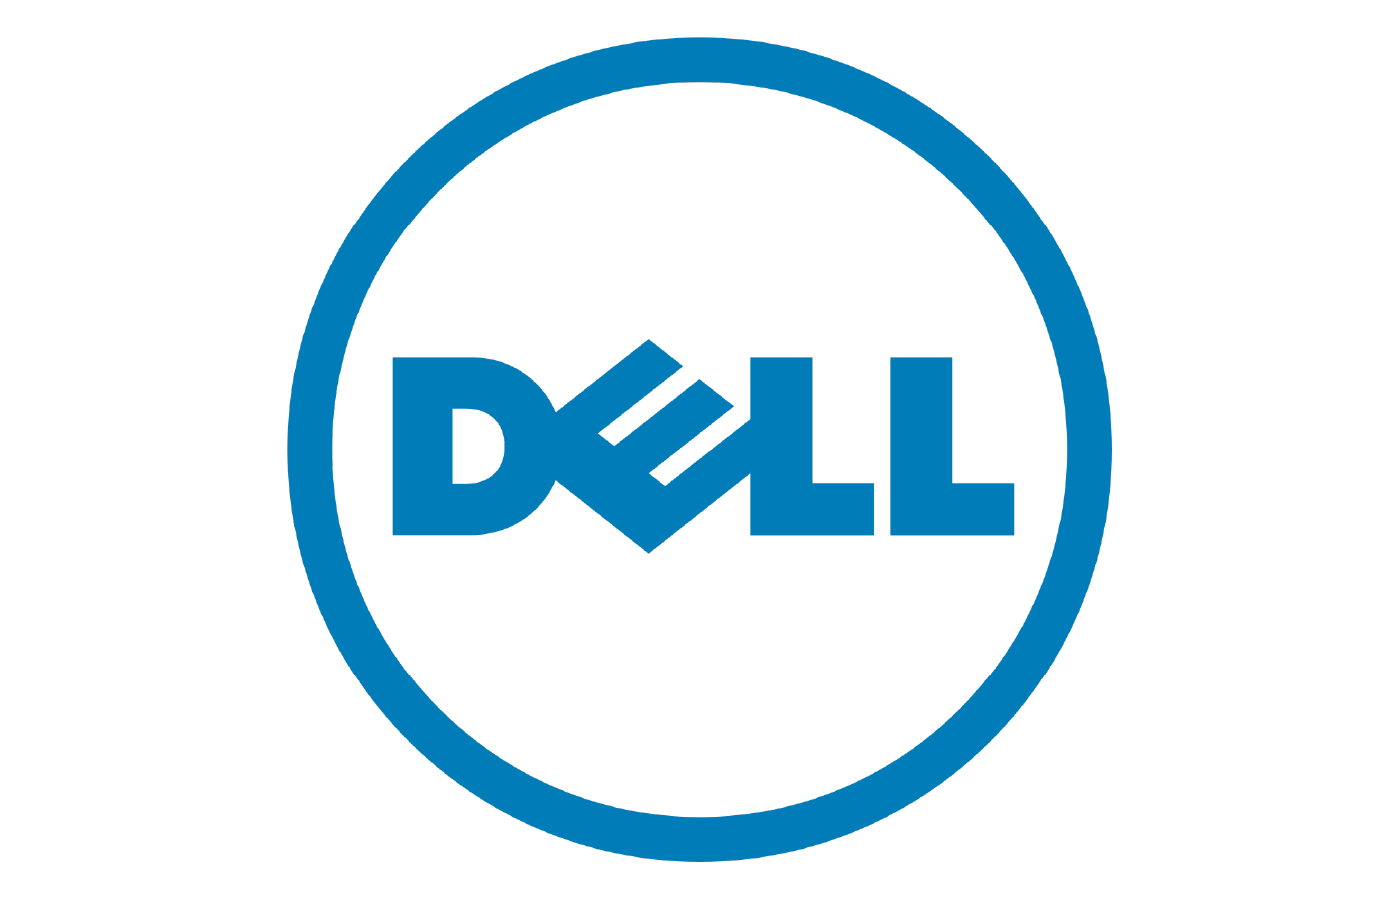 وکالت به سبک Dell